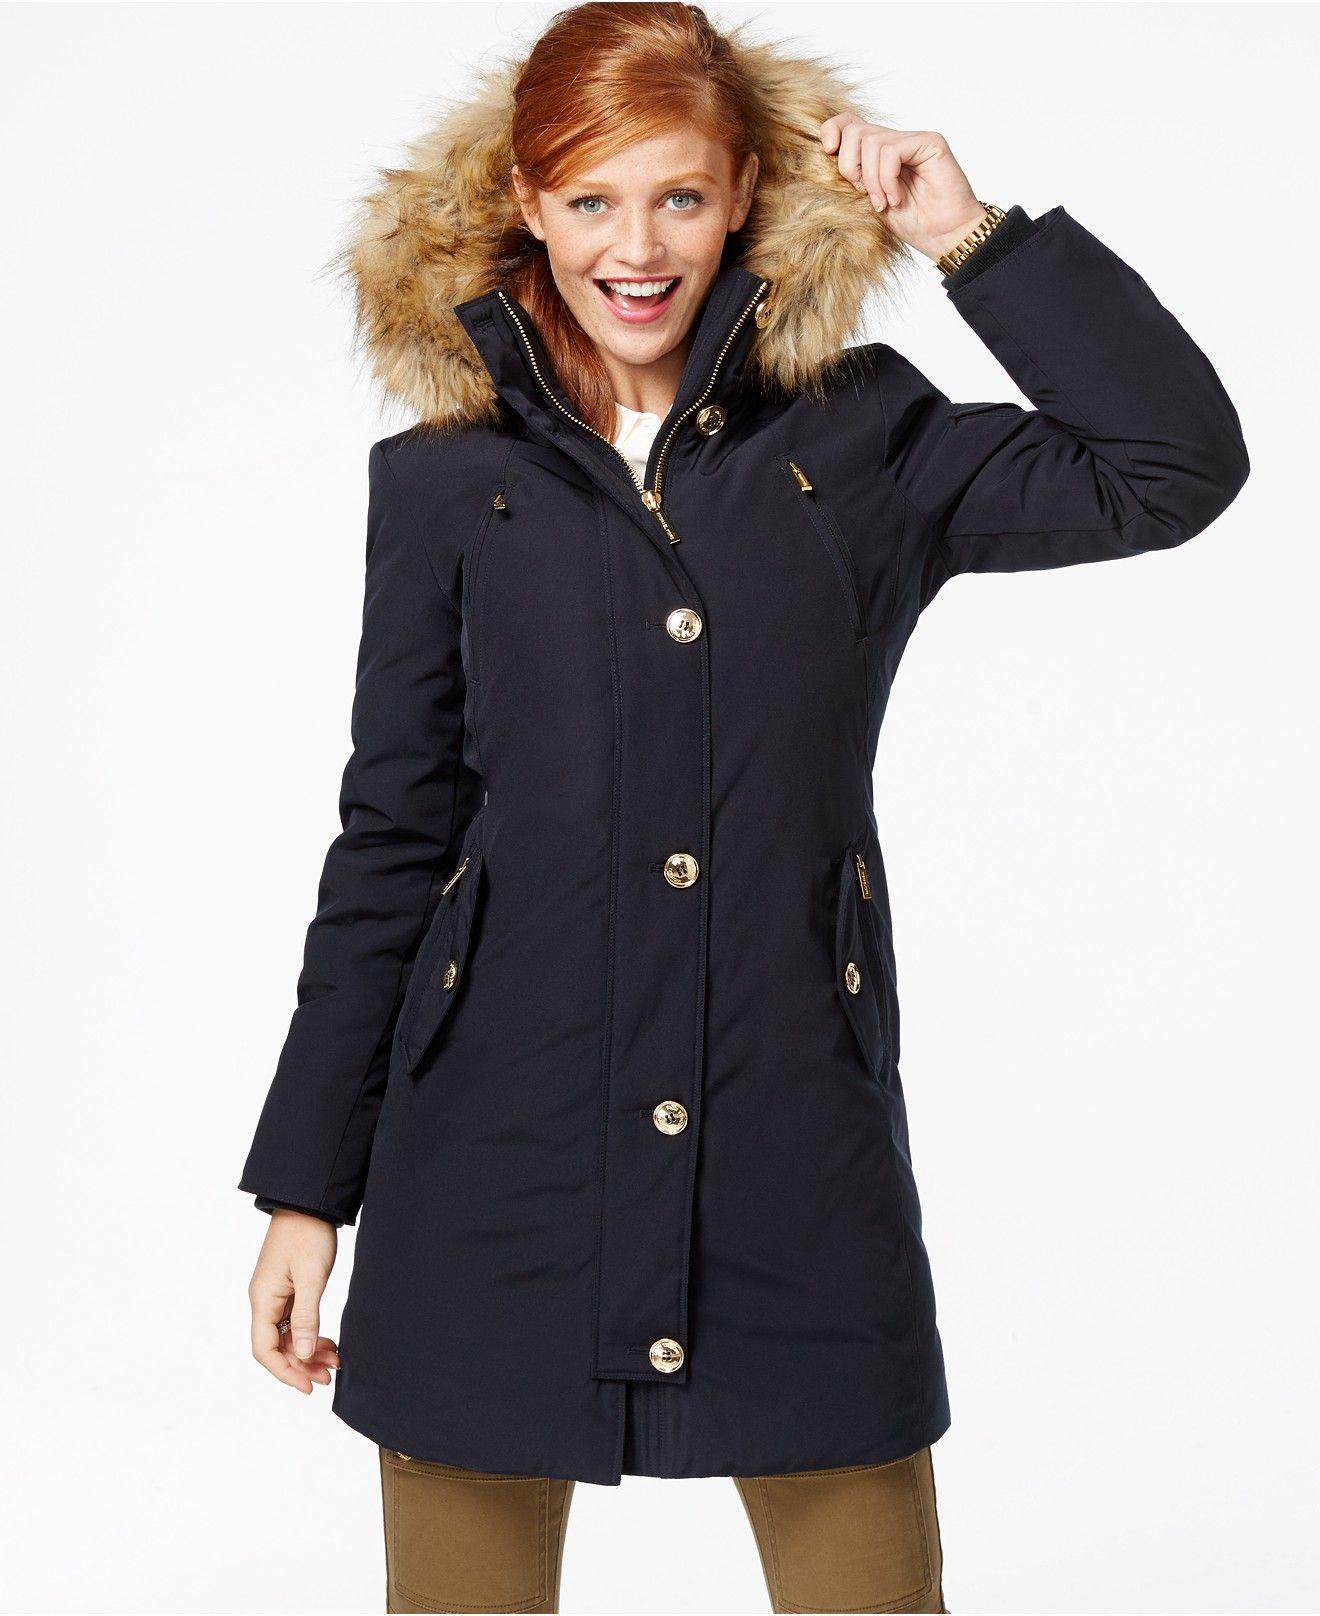 dd7af6b3519f8a MICHAEL Michael Kors Faux-Fur-Hood Down Parka - Coats - Women - Macy s